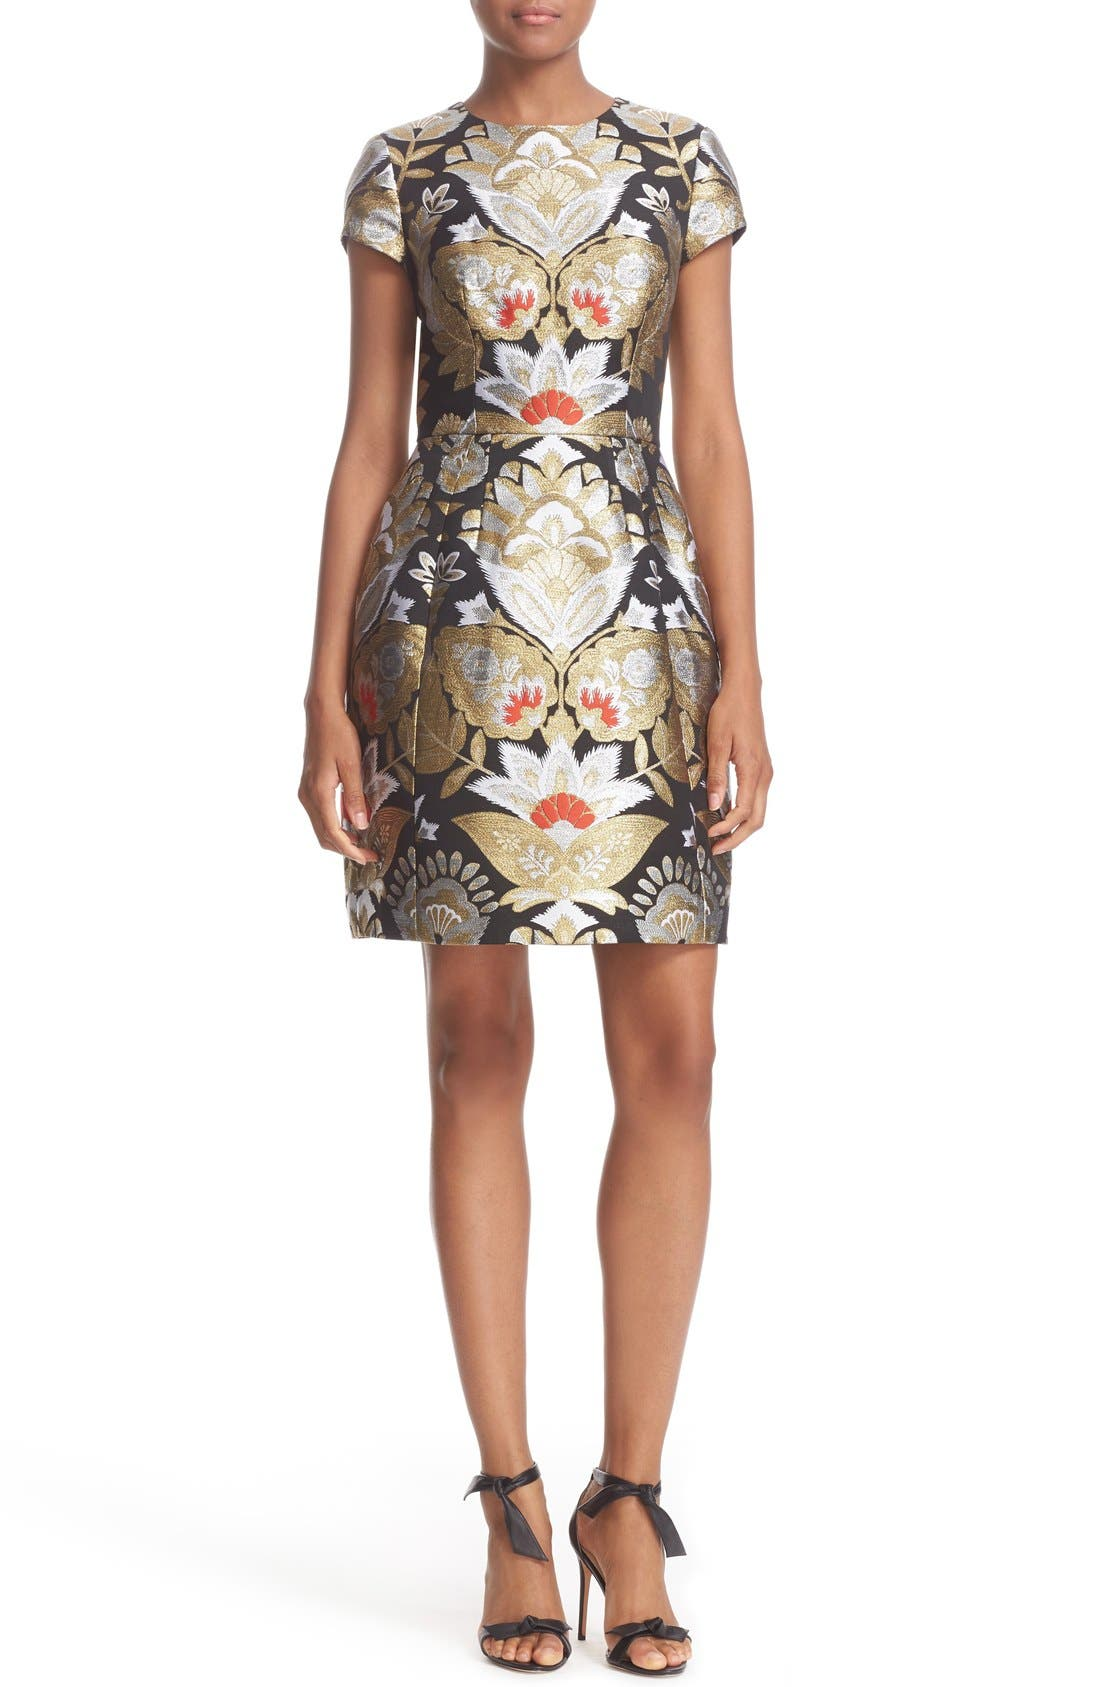 Alternate Image 1 Selected - Ted Baker London Imoen Opulent Orient Jacquard Fit & Flare Dress